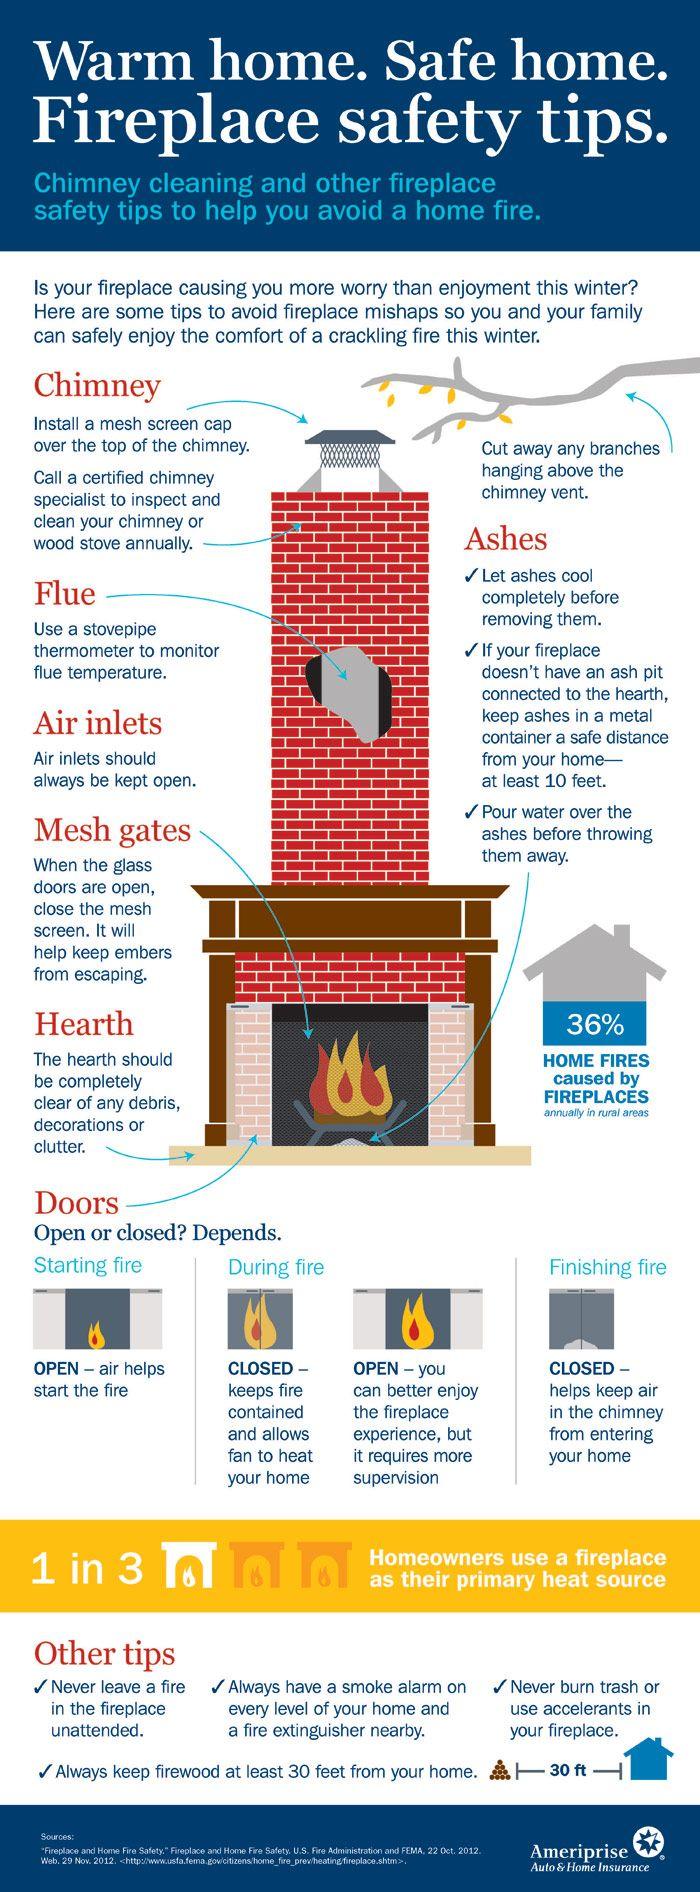 Fireplace Safety #Tips